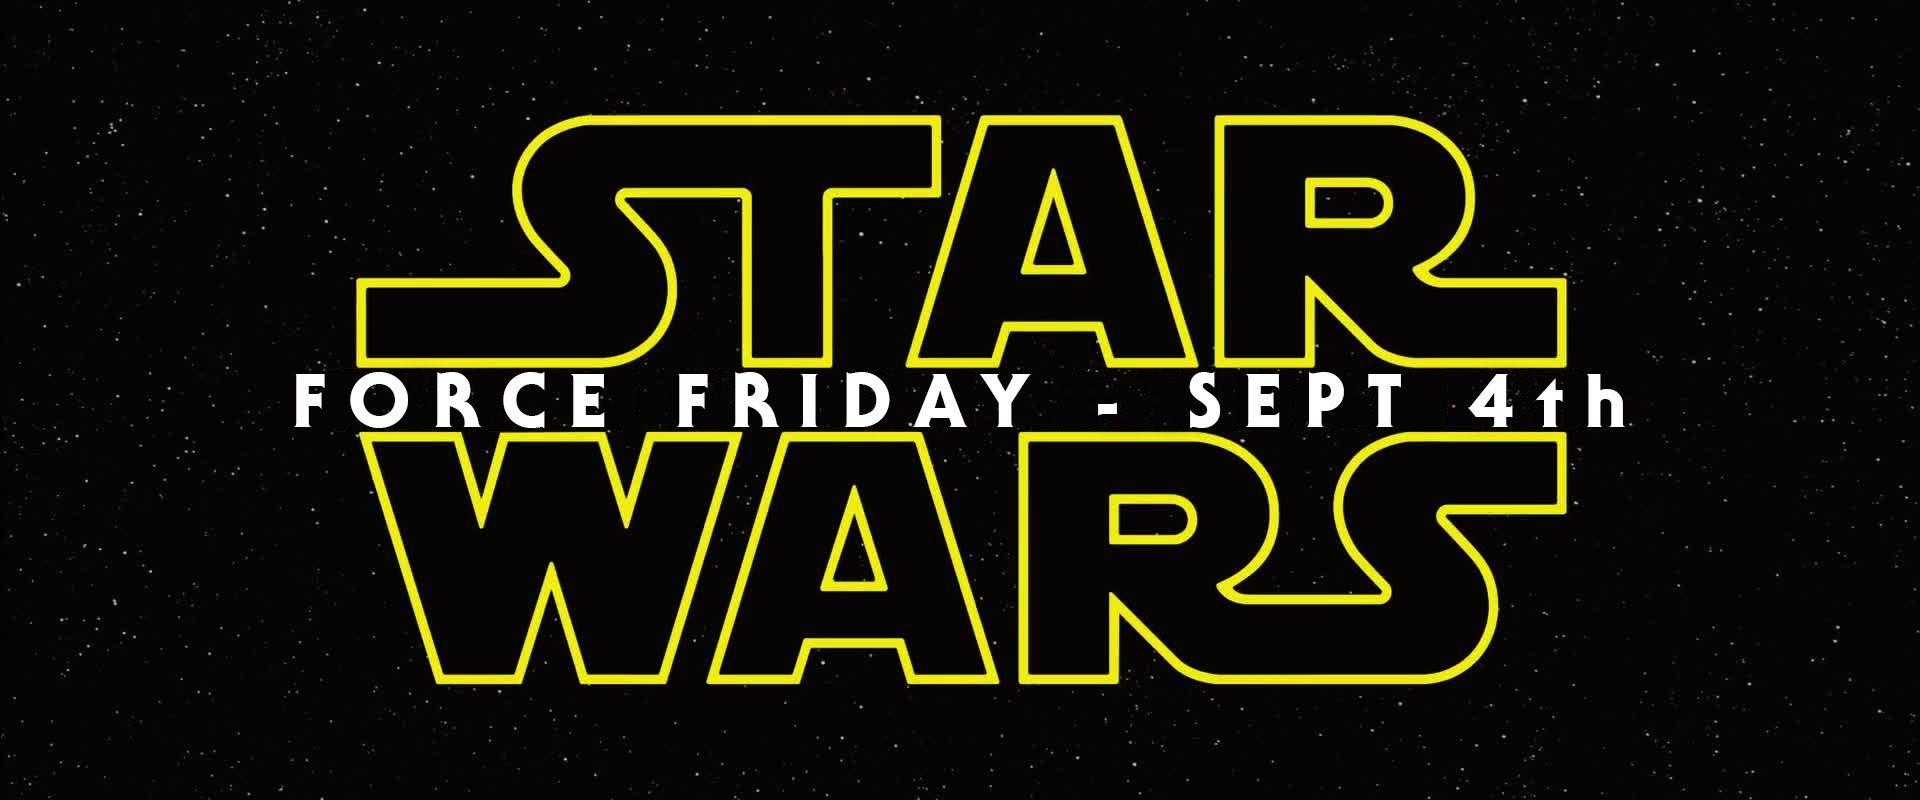 Star Wars Force Friday Logo September 4th 2015 1920 800 Star Wars Movie Star Wars Film Star Wars Vii